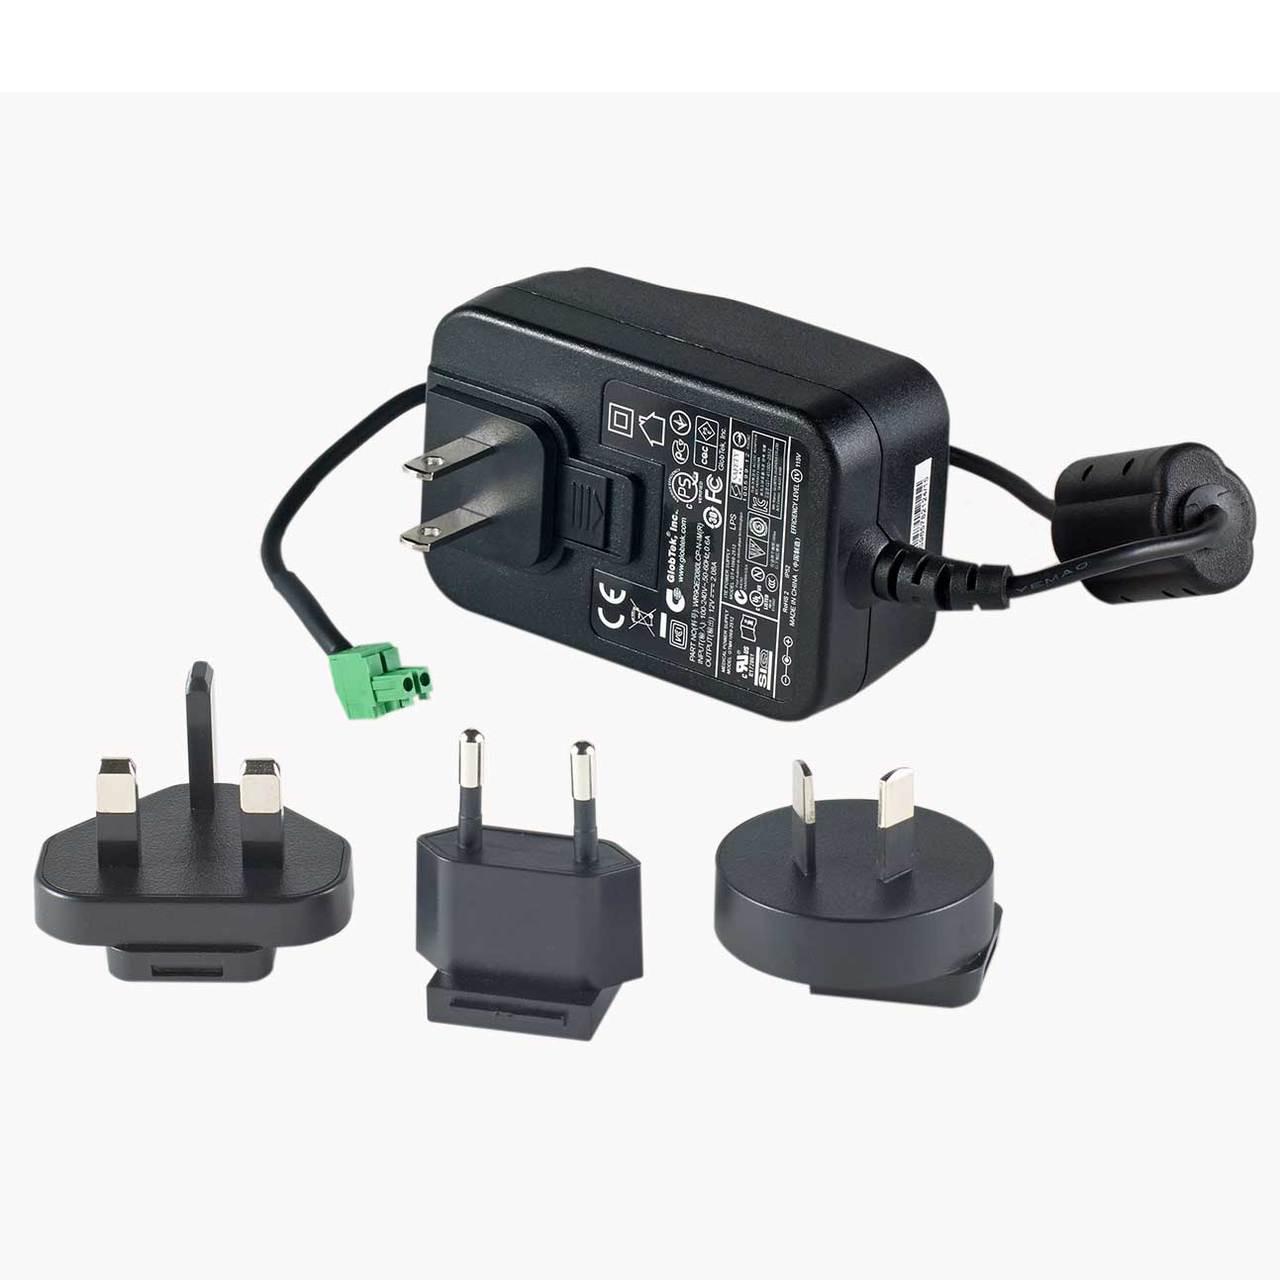 Rosco Pica Cube Power Adapter, 25W/12VDC   Professional Lighting ...